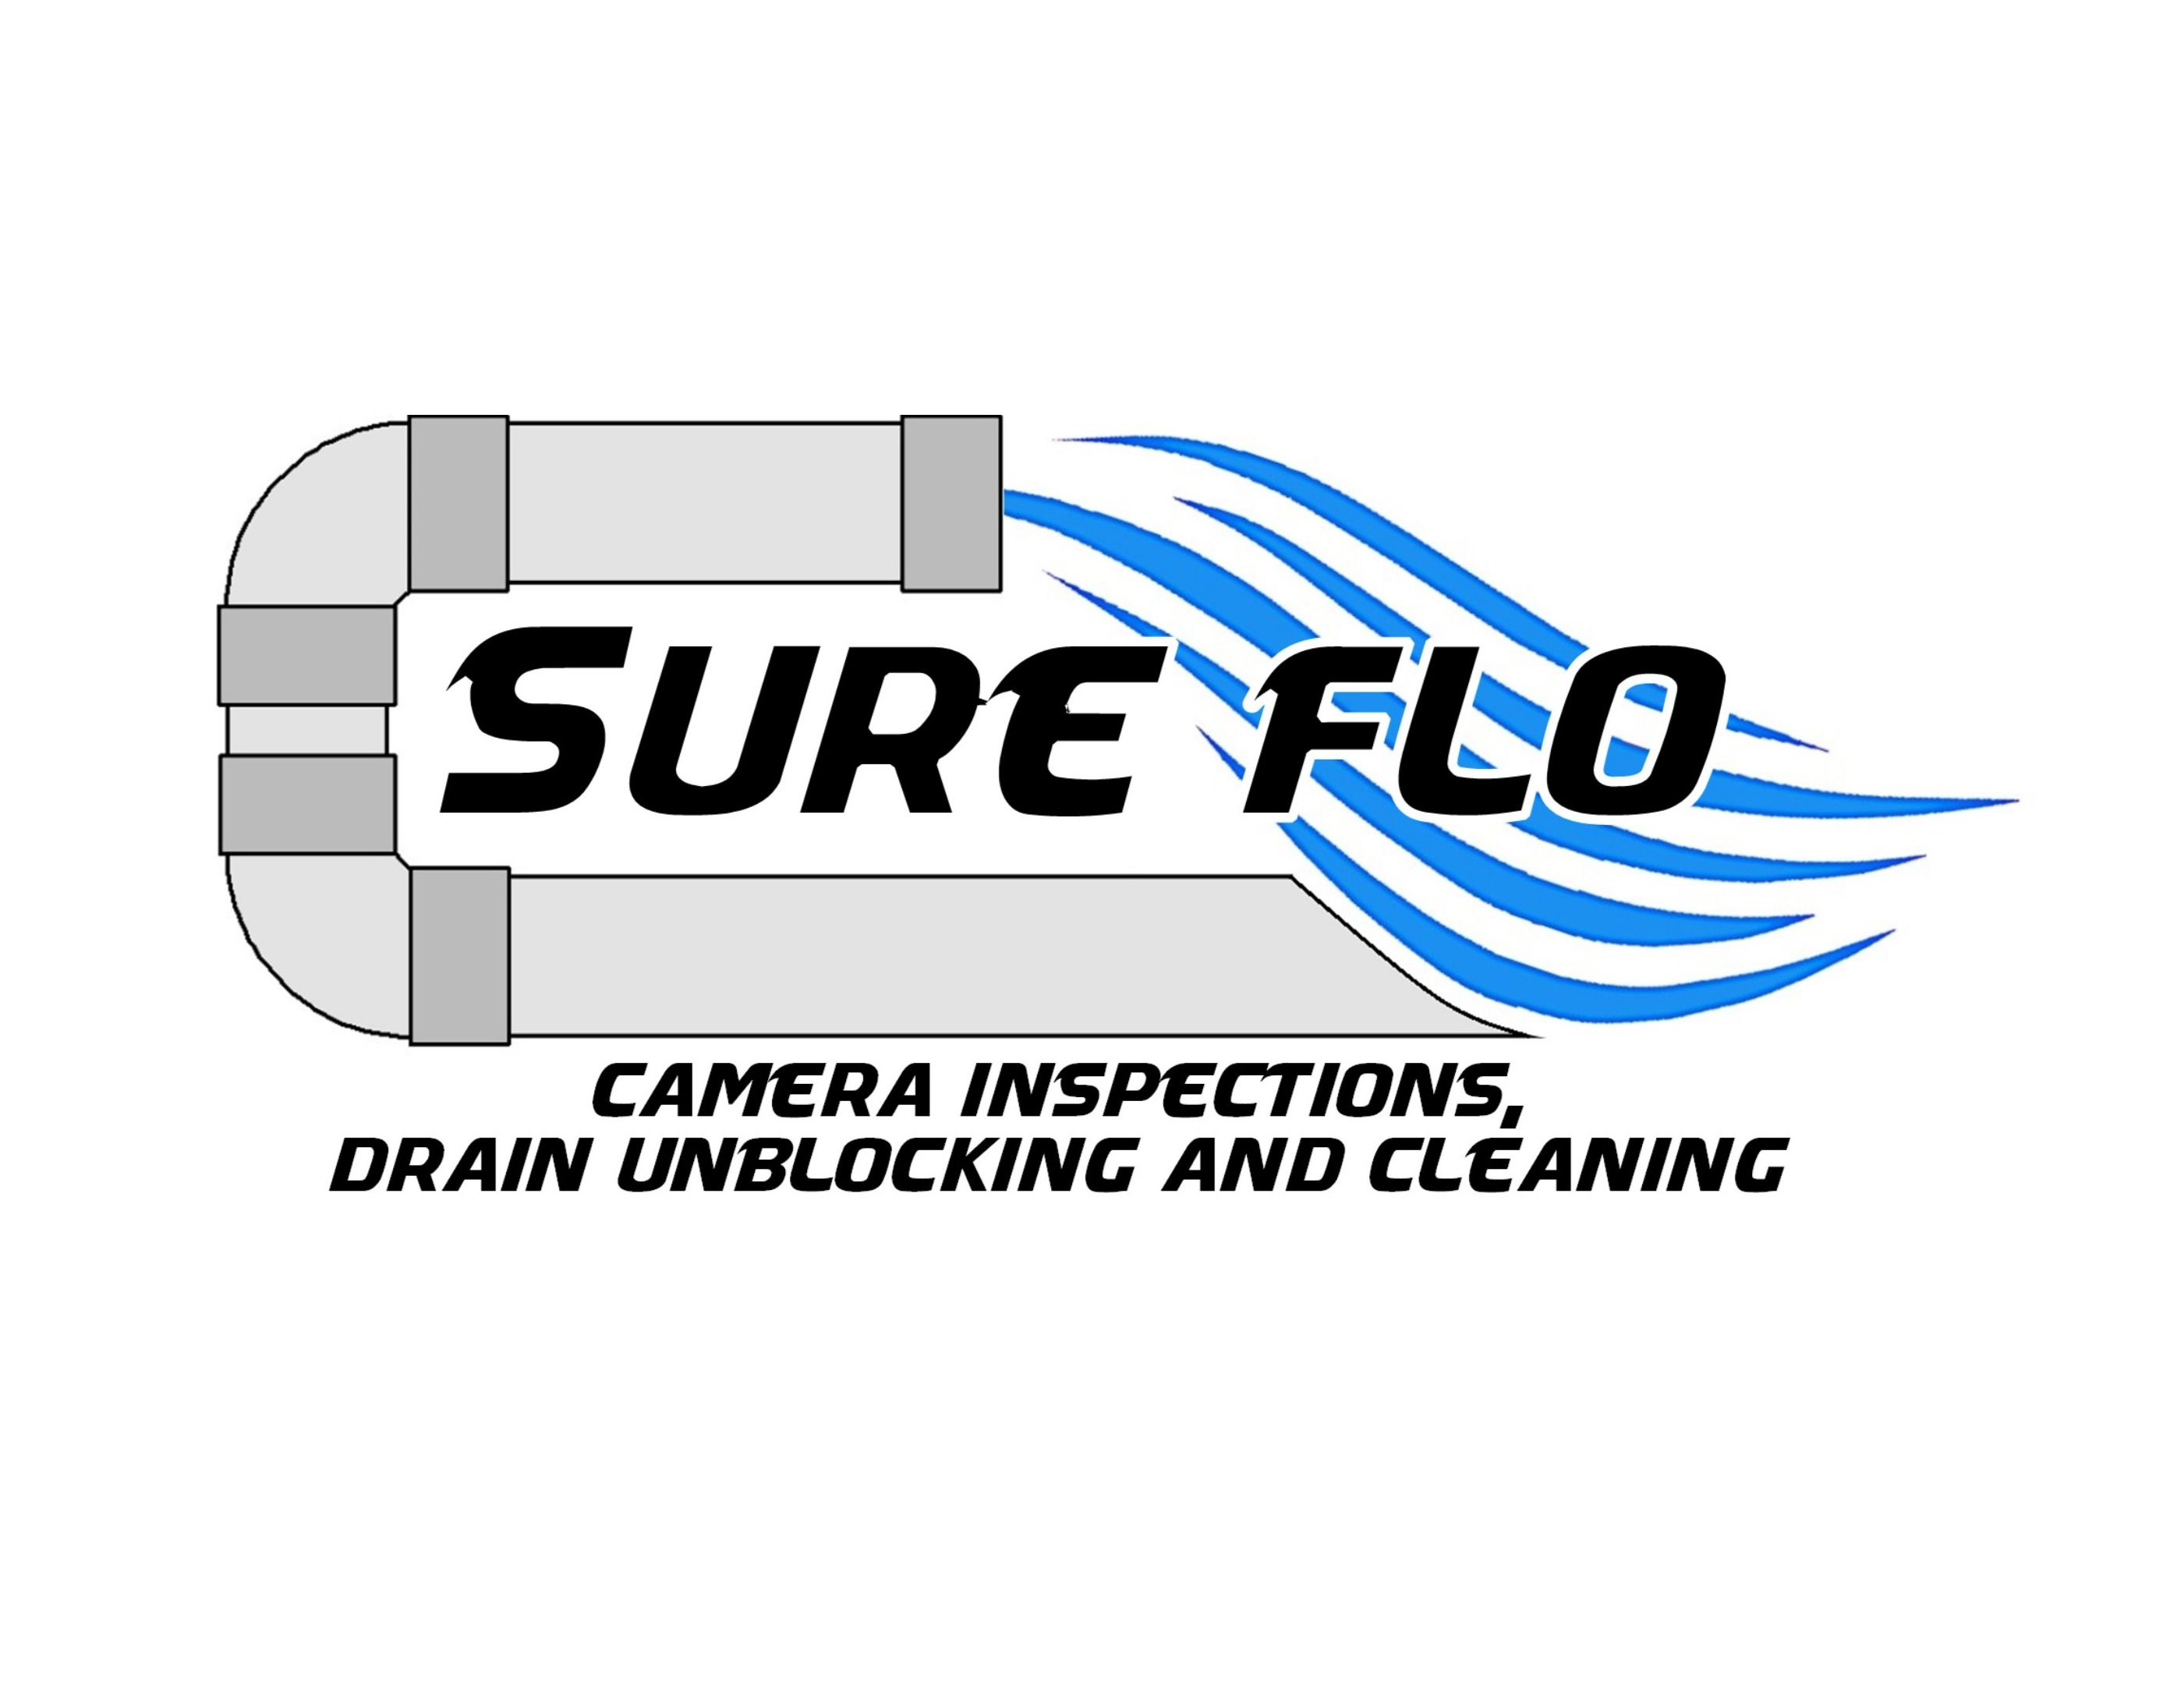 SureFlo